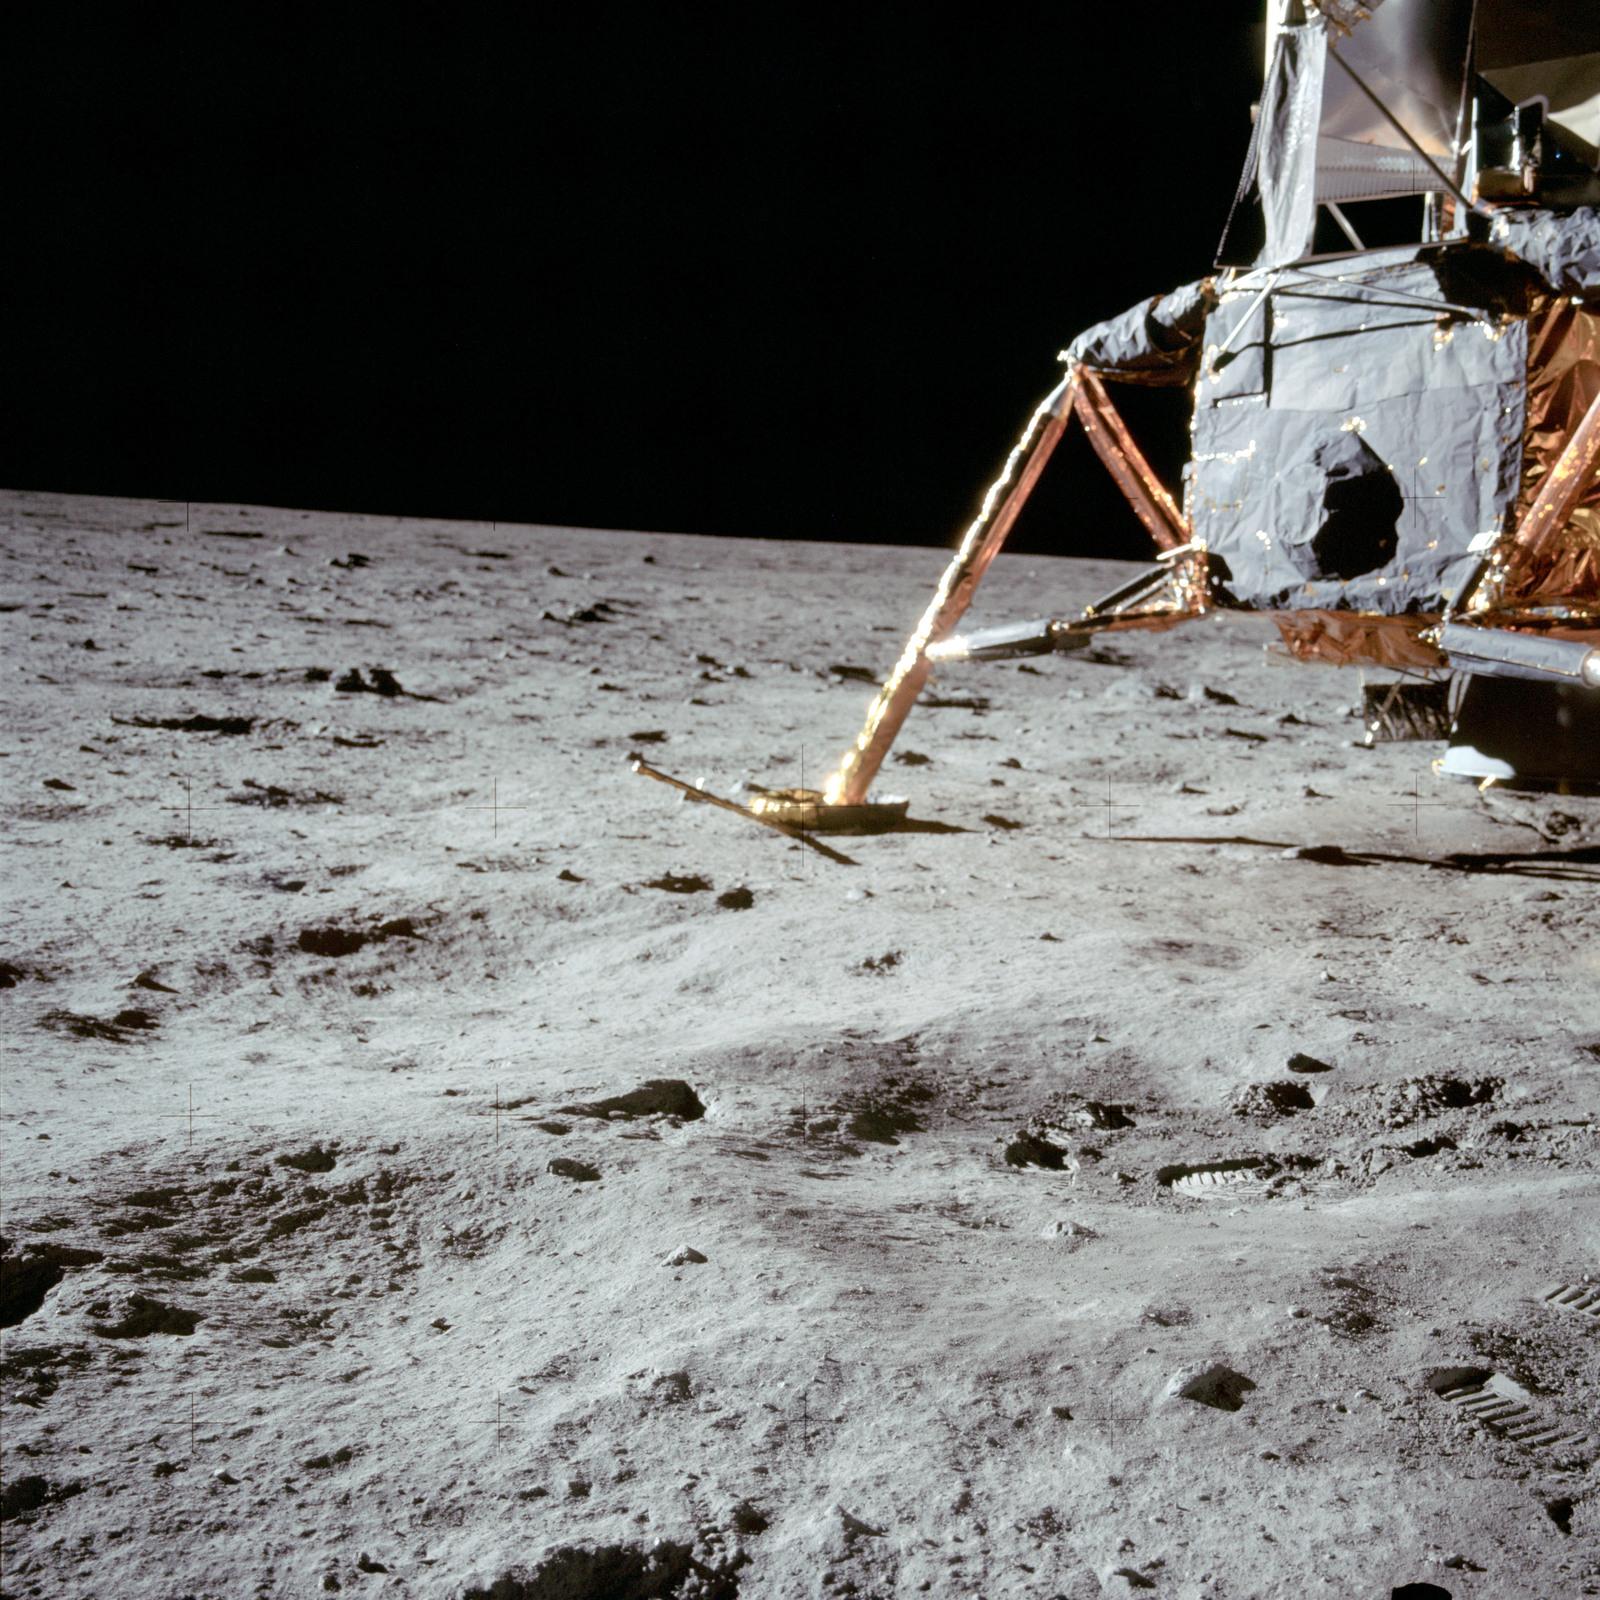 AS11-40-5914 - Apollo 11 - Apollo 11 Mission image -  Lunar surface and horizon with Lunar Module visible